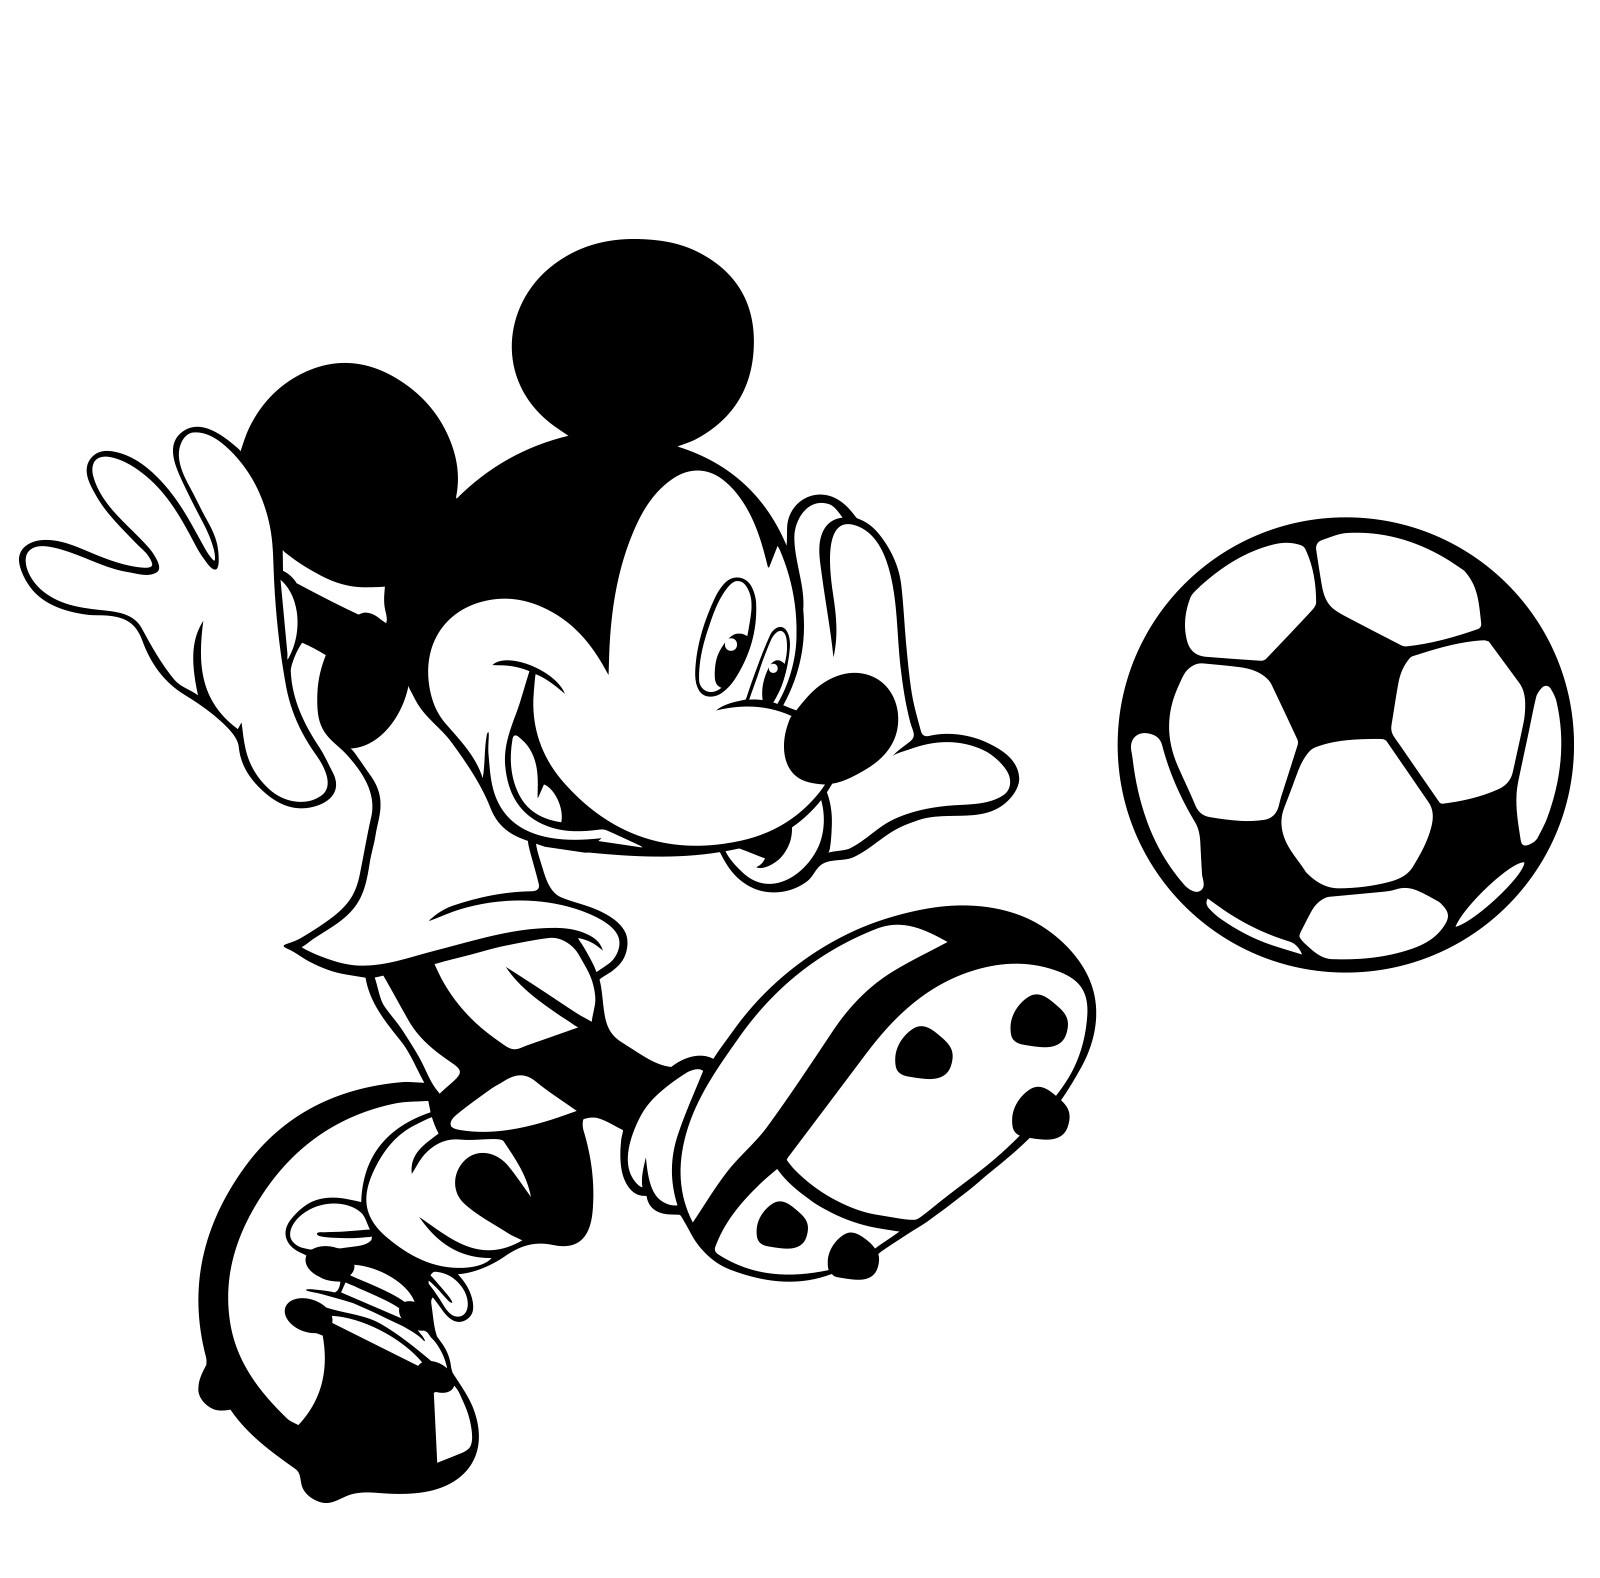 Mickey Mouse Clip Art Free Black And White - Novocom.top